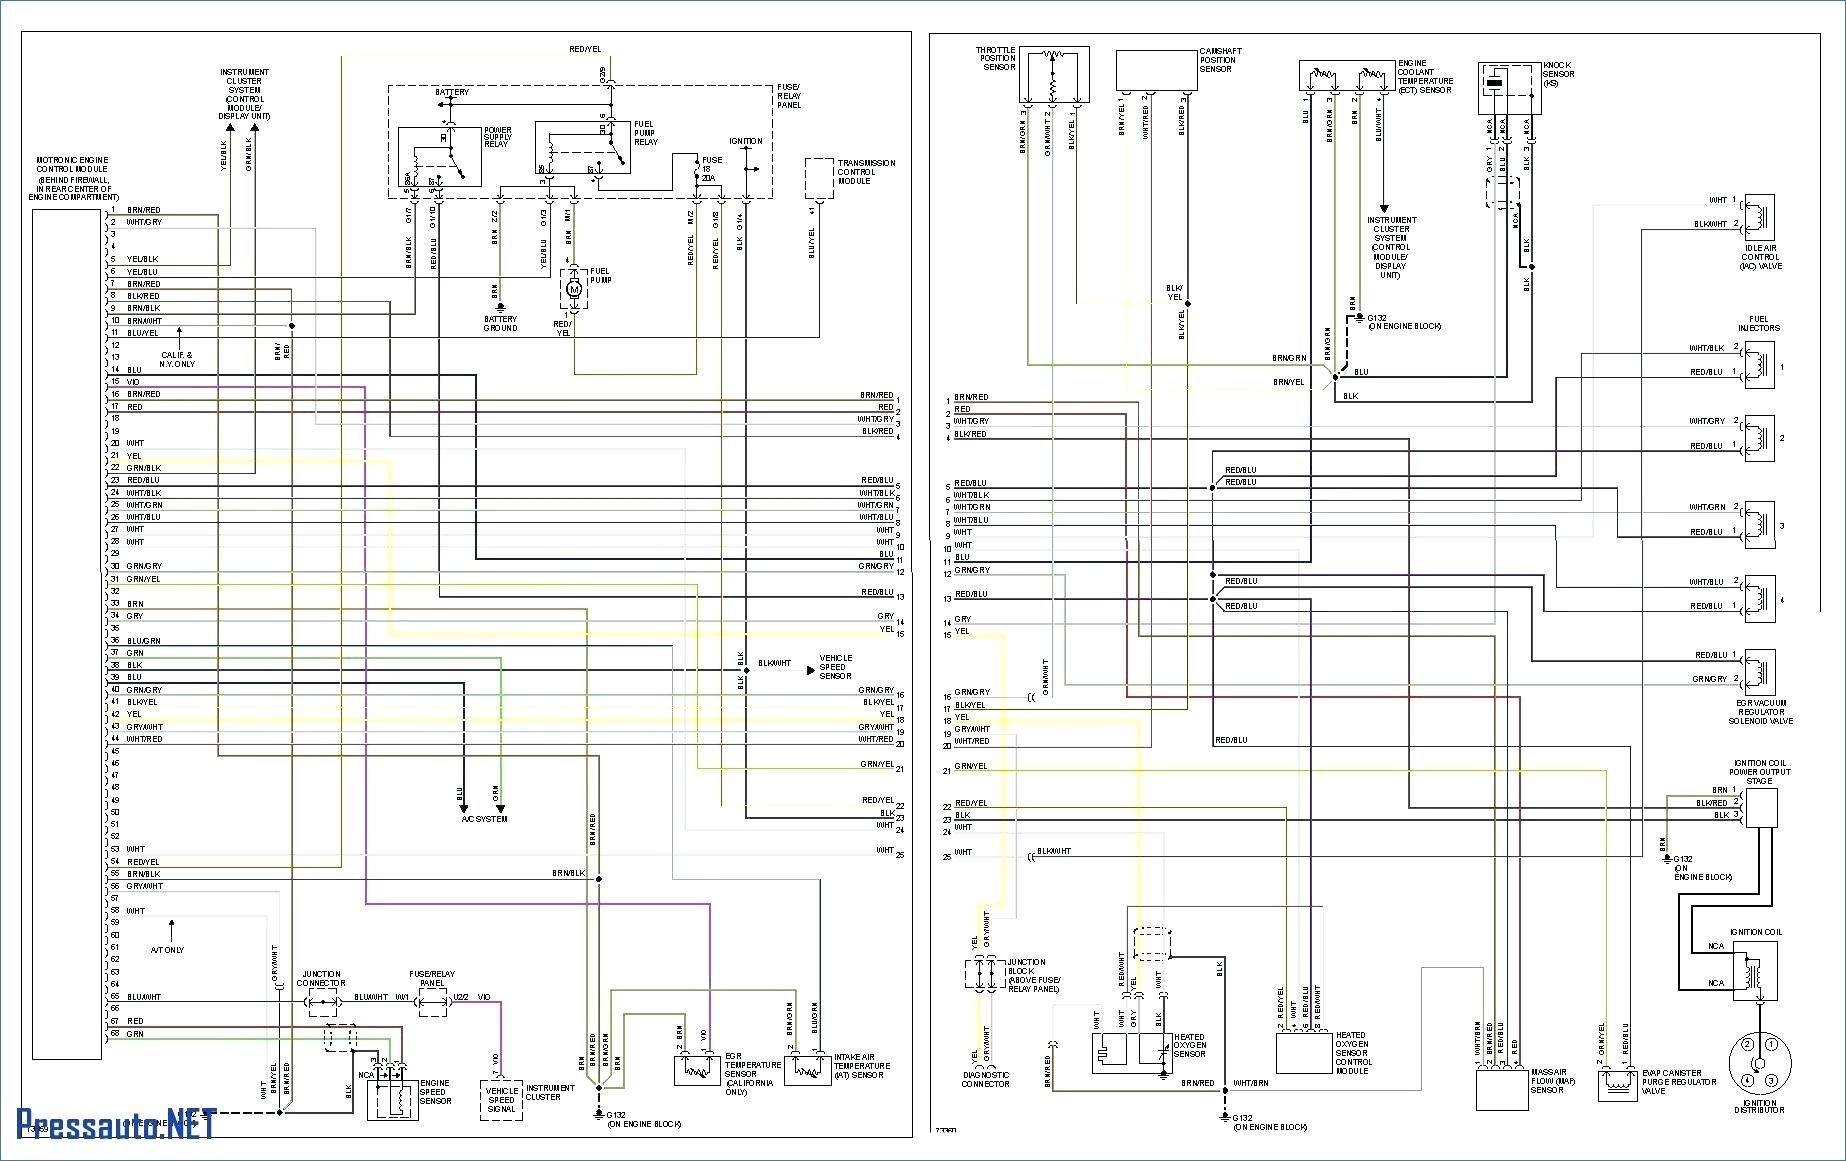 1992 Vw Cabriolet Wiring Diagram Gm Starter Wiring Diagram 1965 Vww 69 Yenpancane Jeanjaures37 Fr